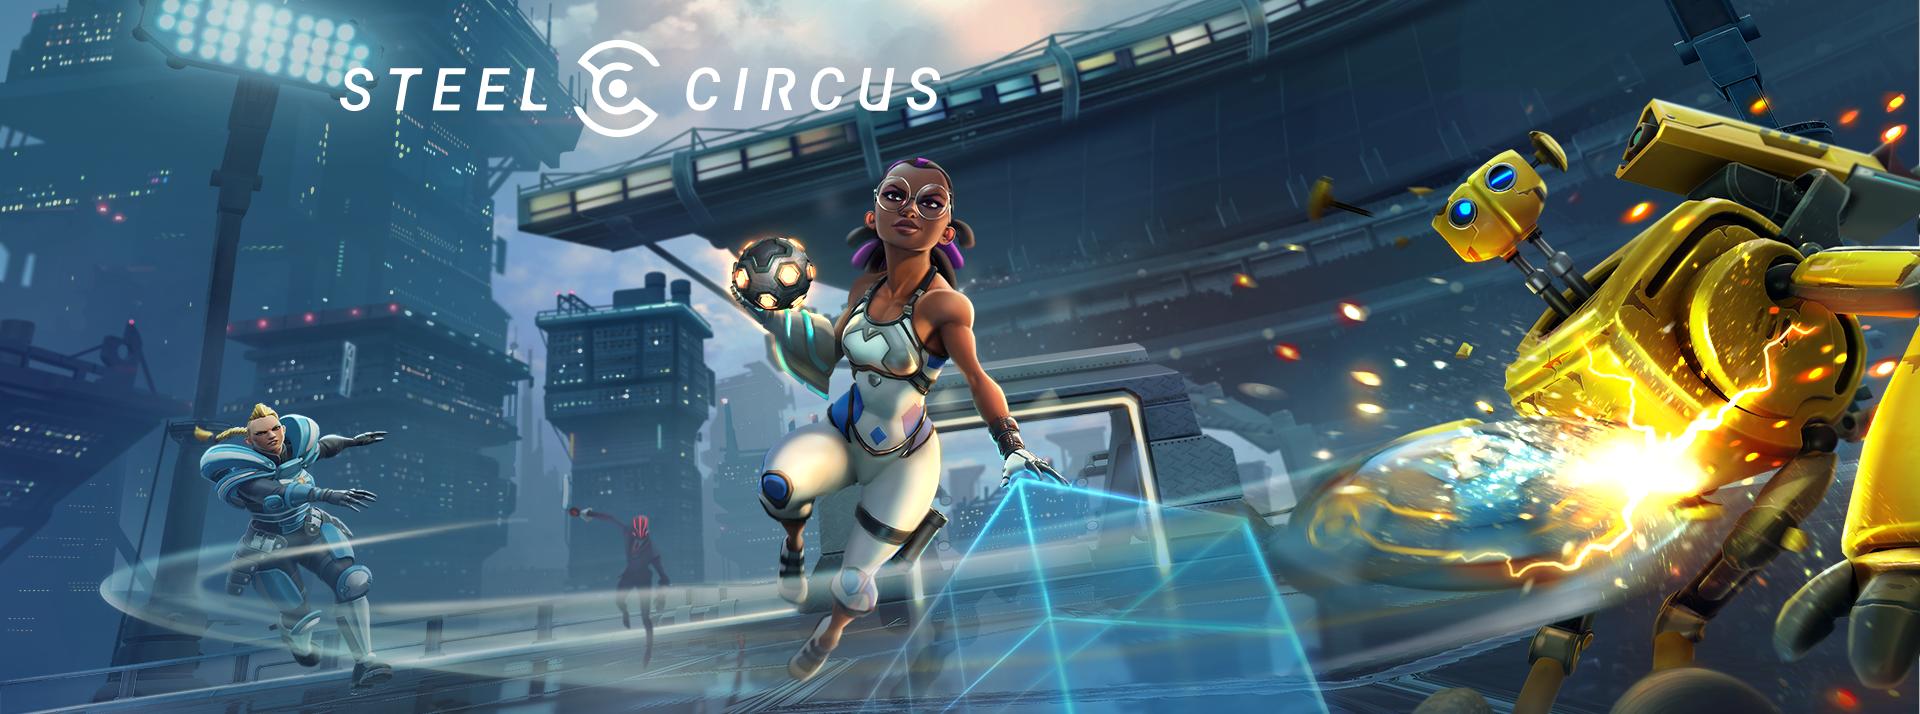 3_Steel Circus